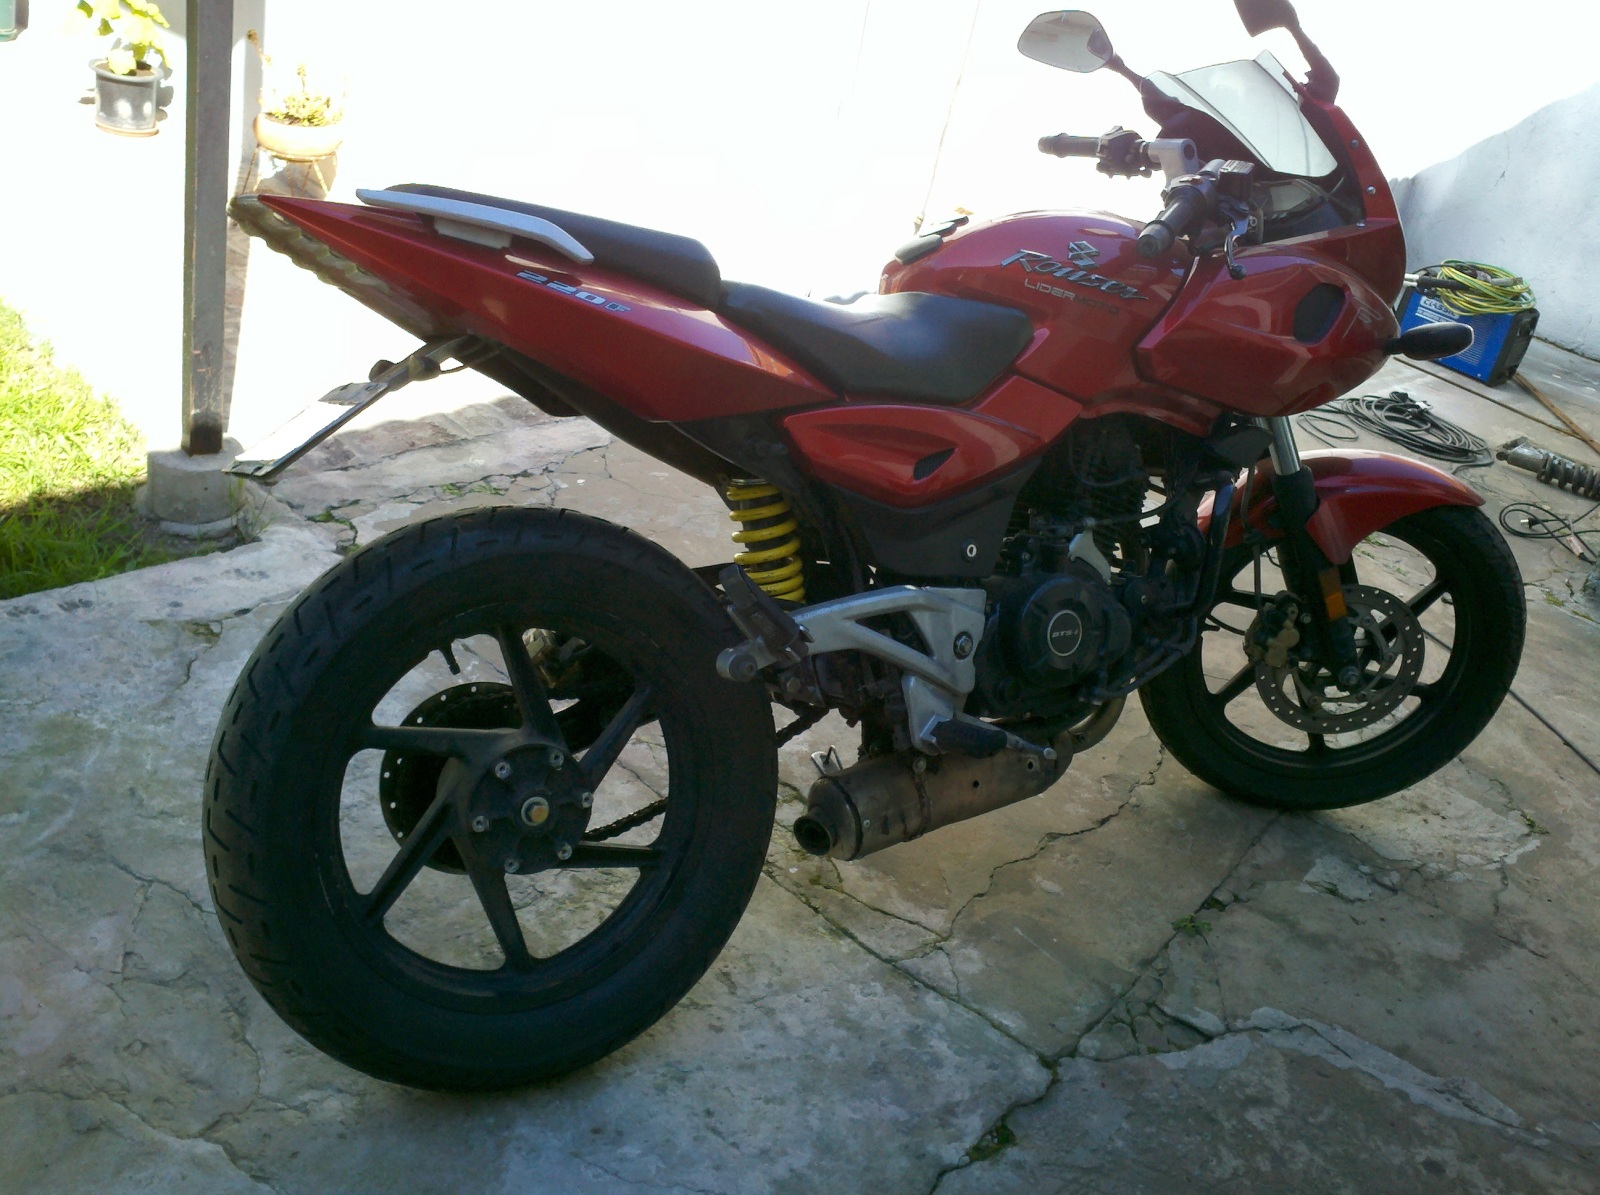 monoshock, ahora monobrazo!!!!!!!!!! 220f Ariel Vergara 16hy85